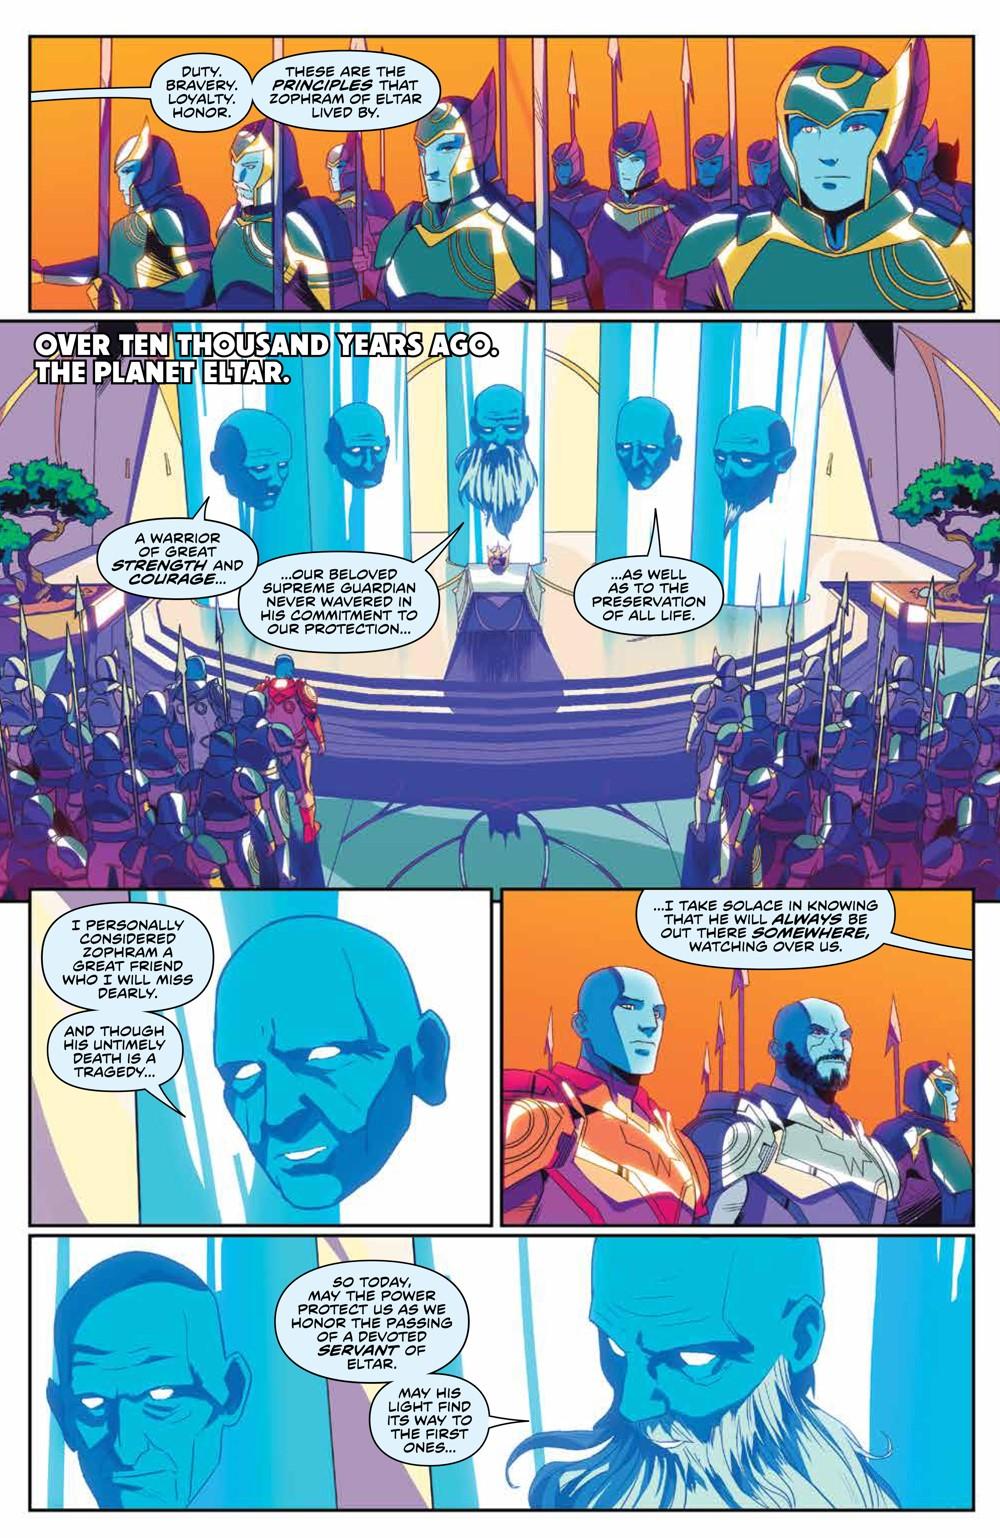 MightyMorphin_012_PRESS_3 ComicList Previews: MIGHTY MORPHIN #12